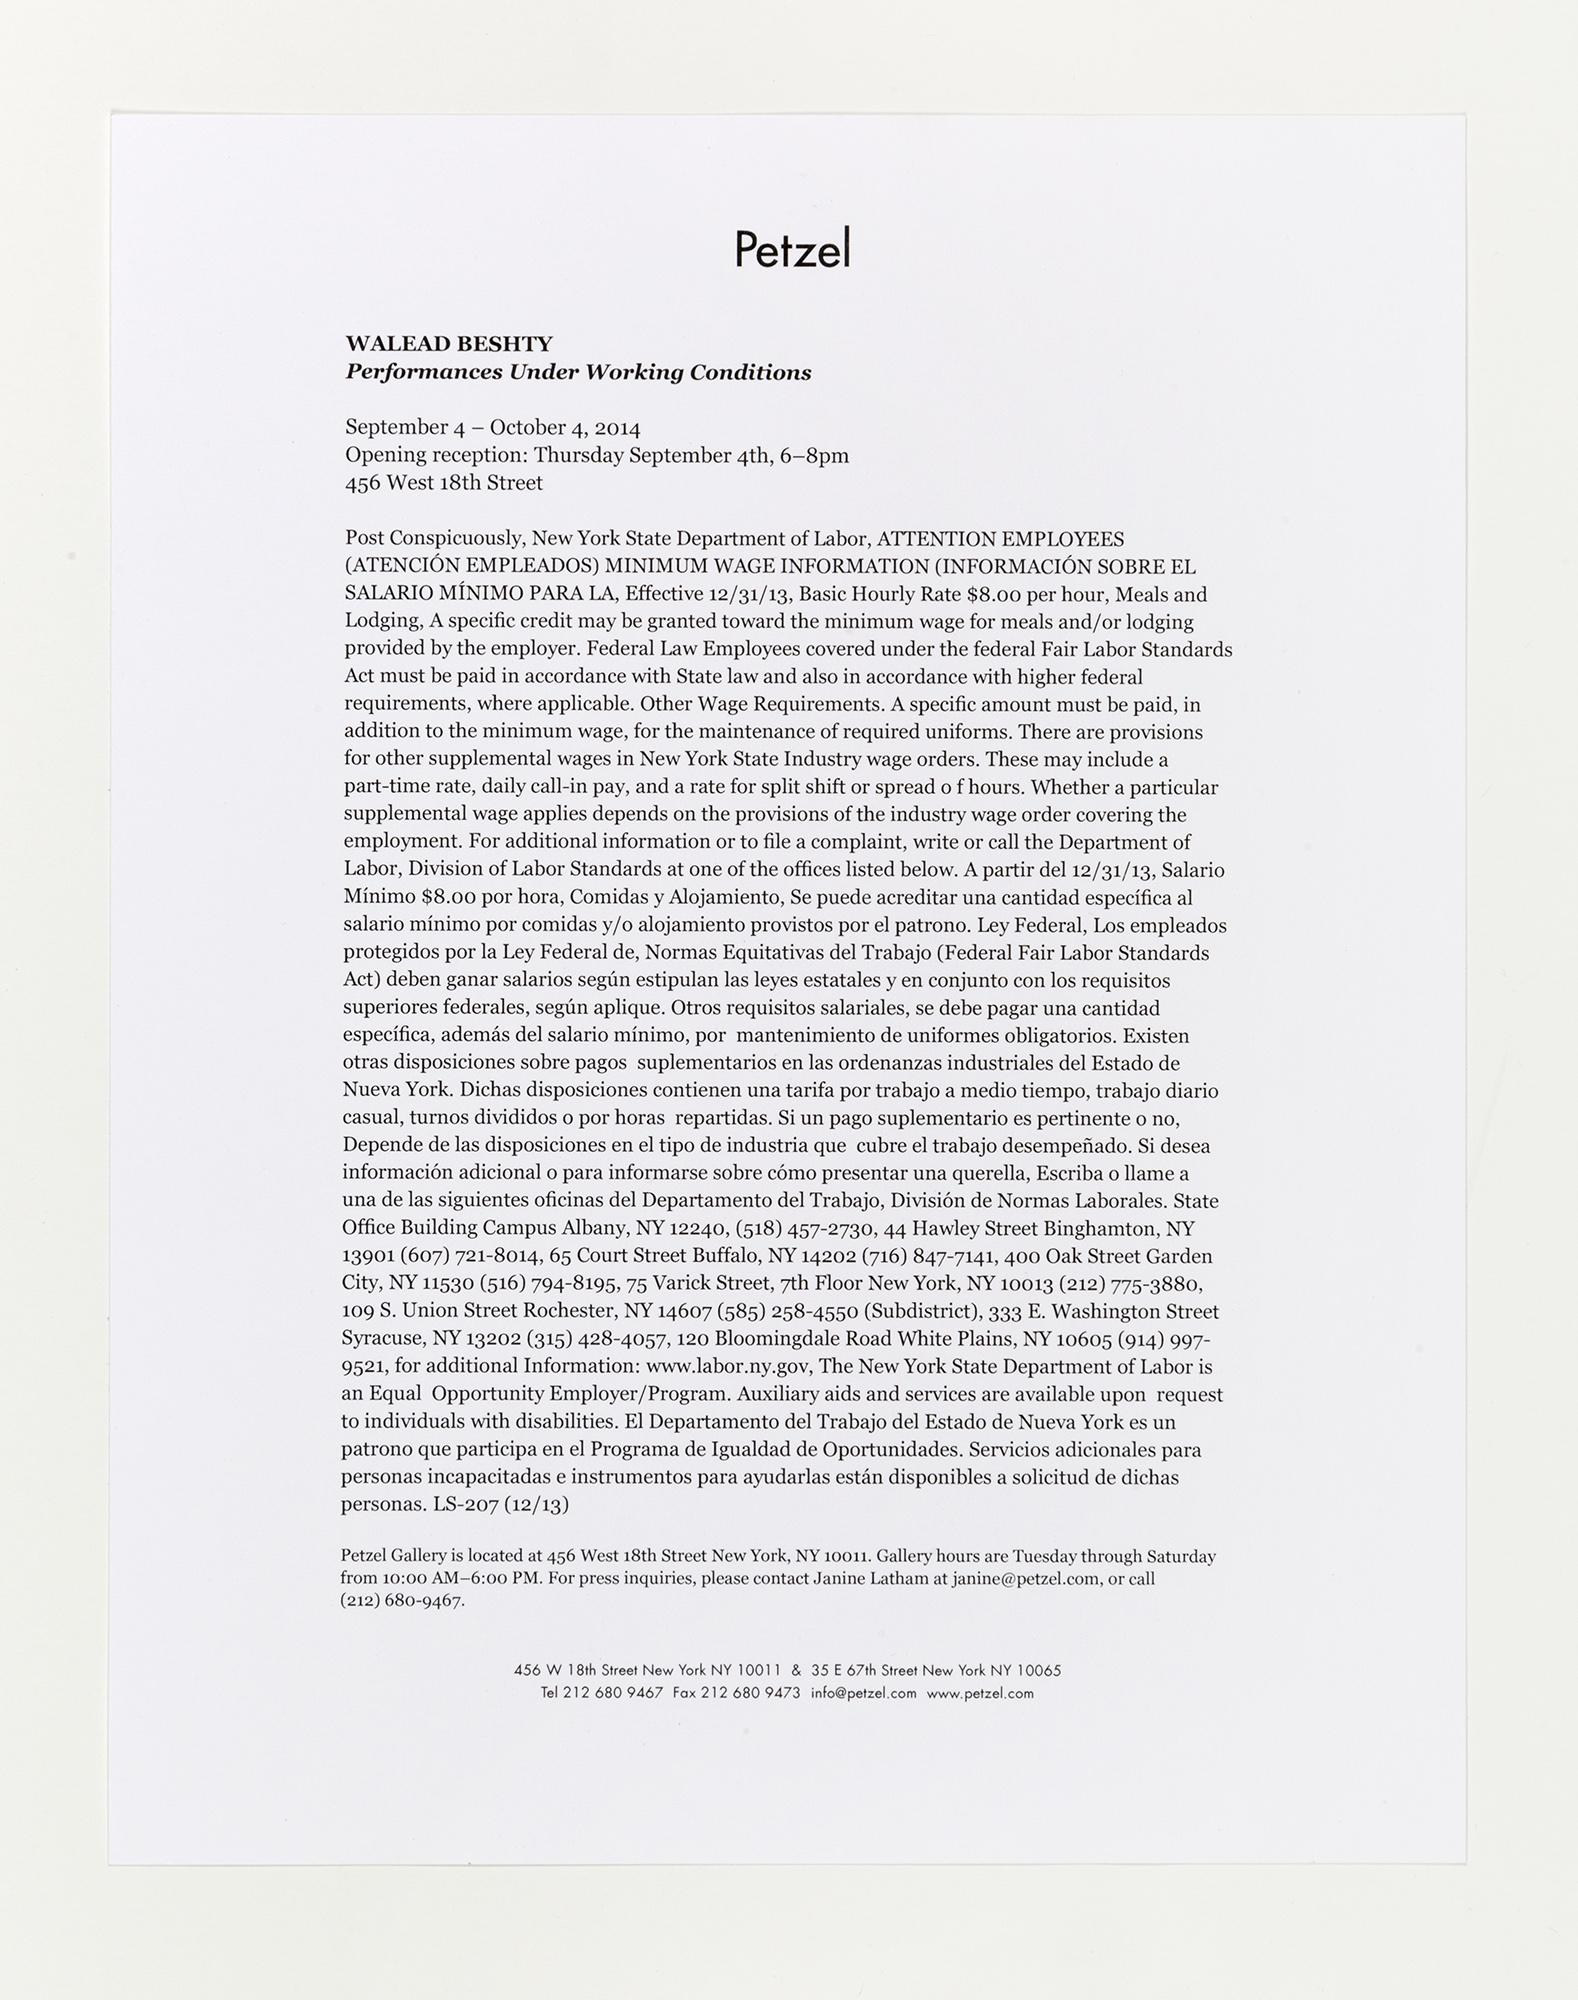 Performances Under Working Conditions press release   Petzel  New York  New York  2014